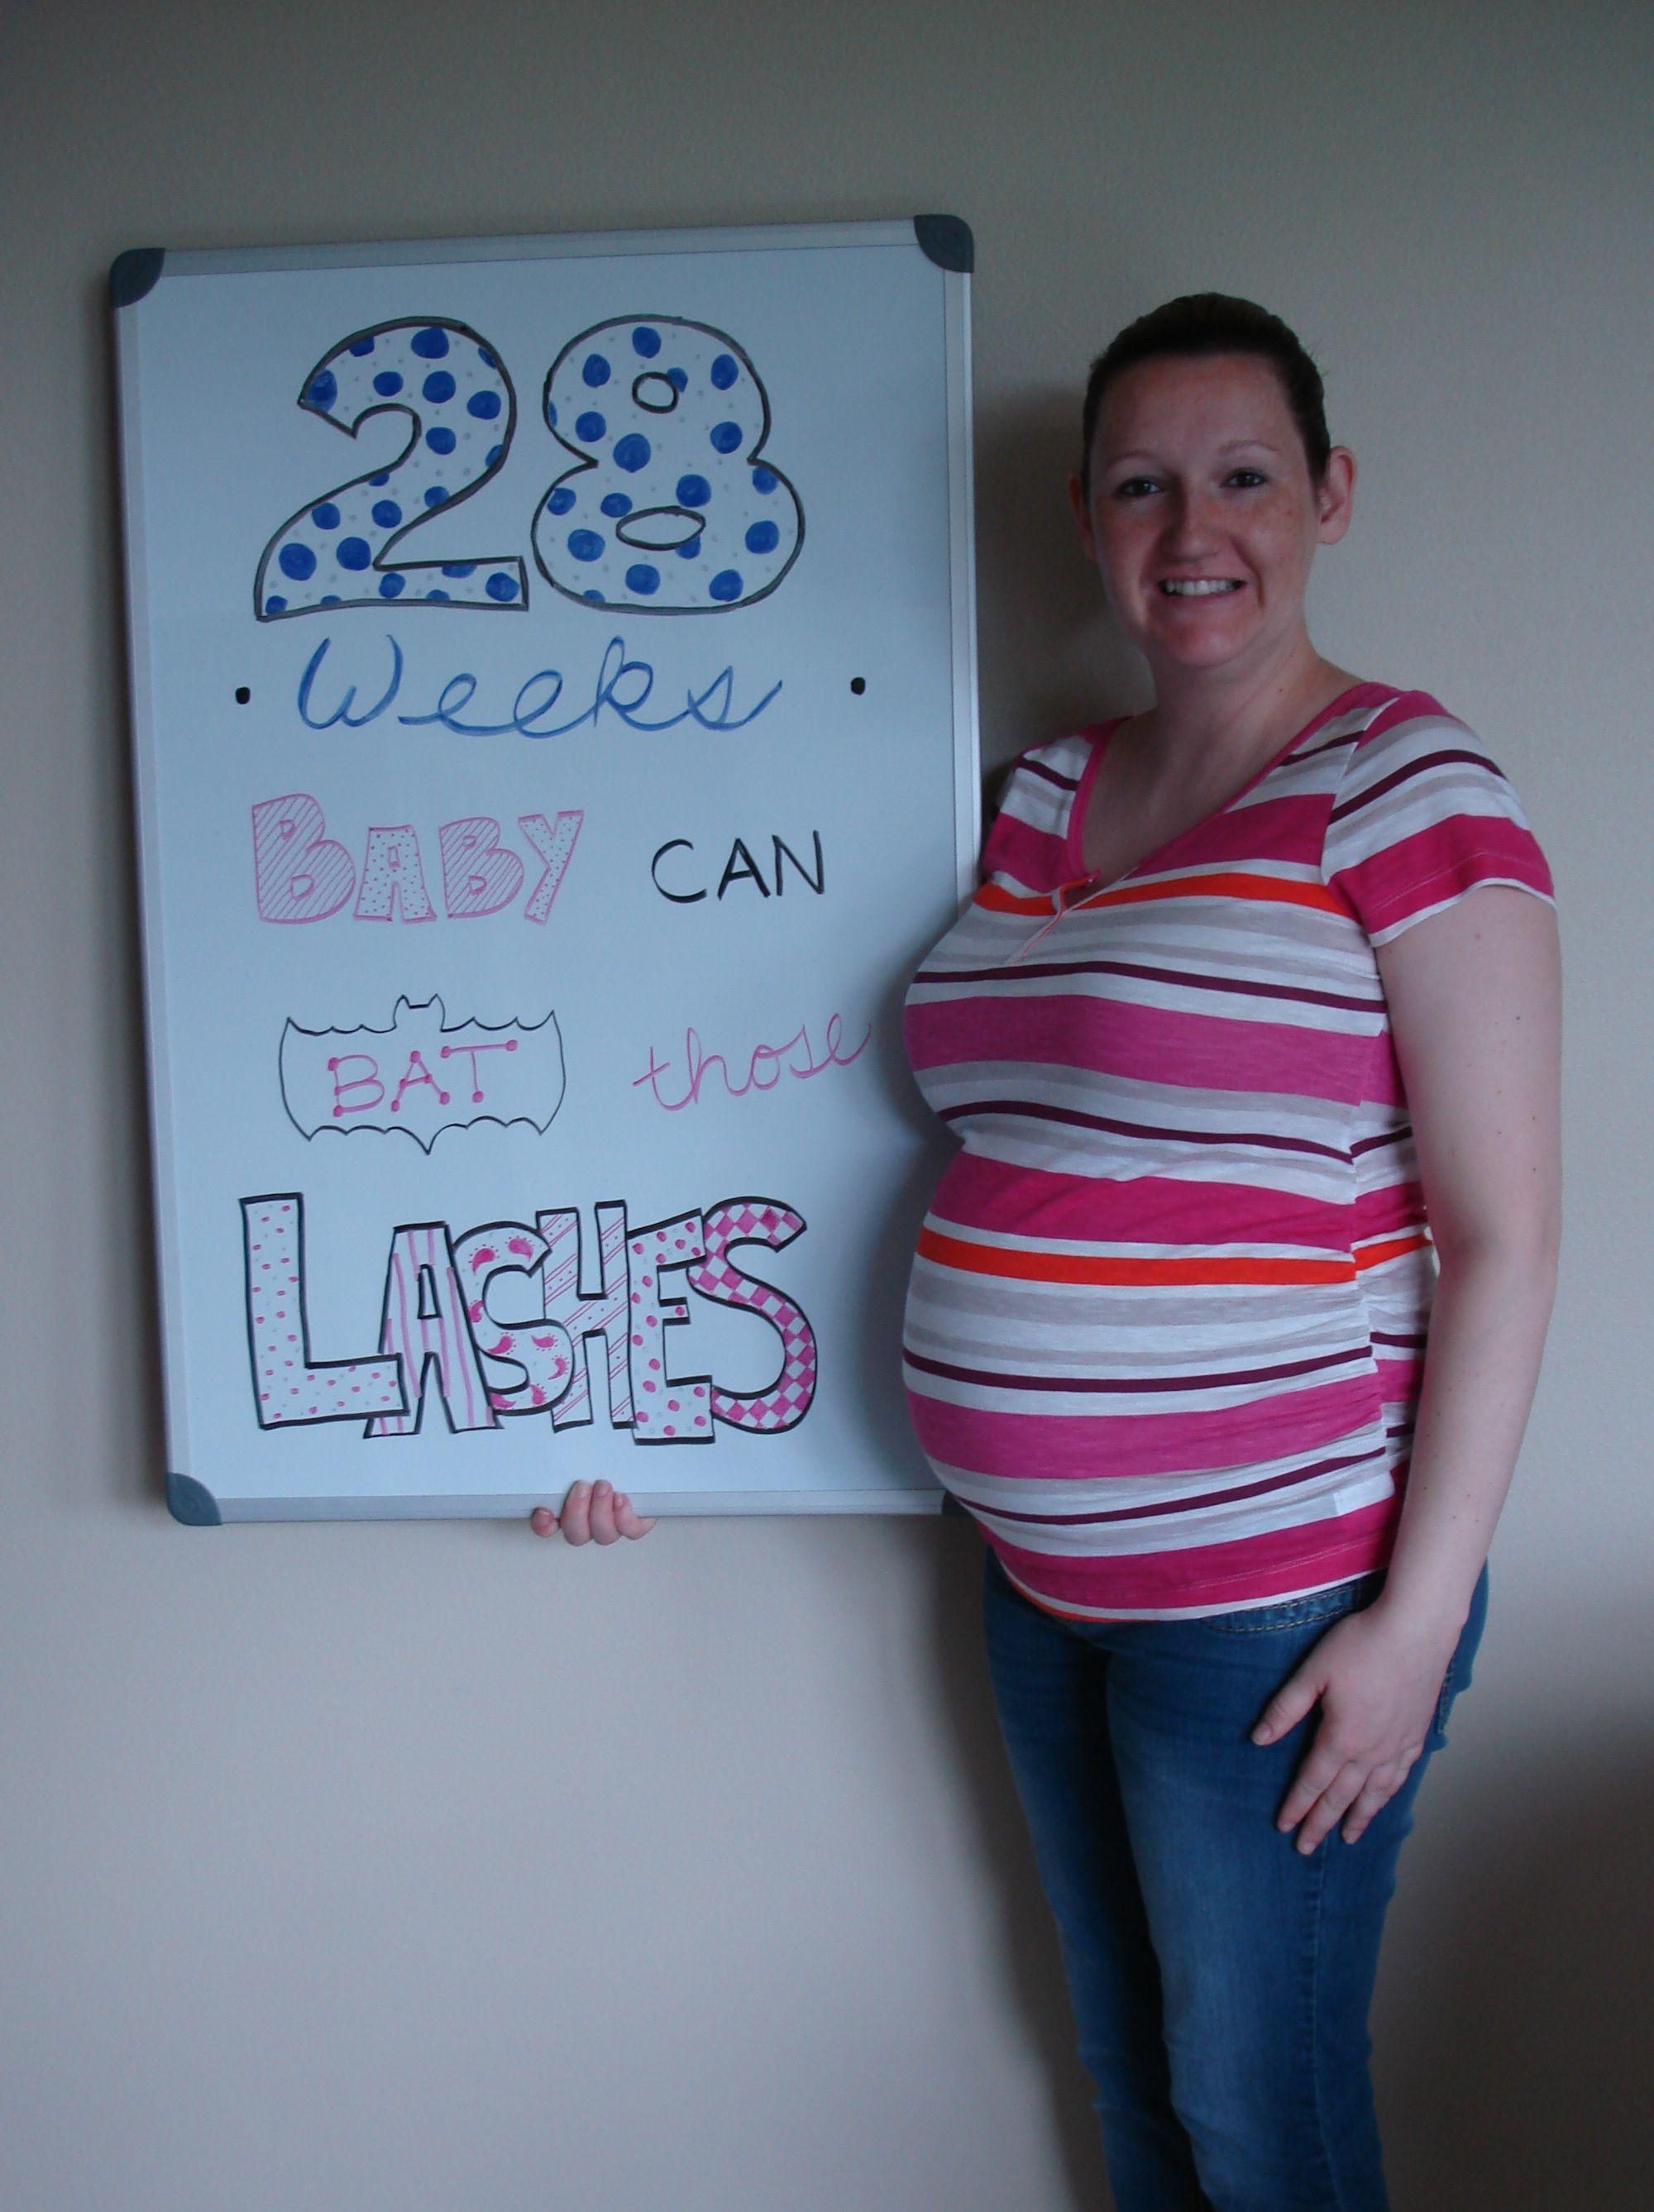 28 Weeks Pregnant   Oh baby babyyy!!   Pinterest